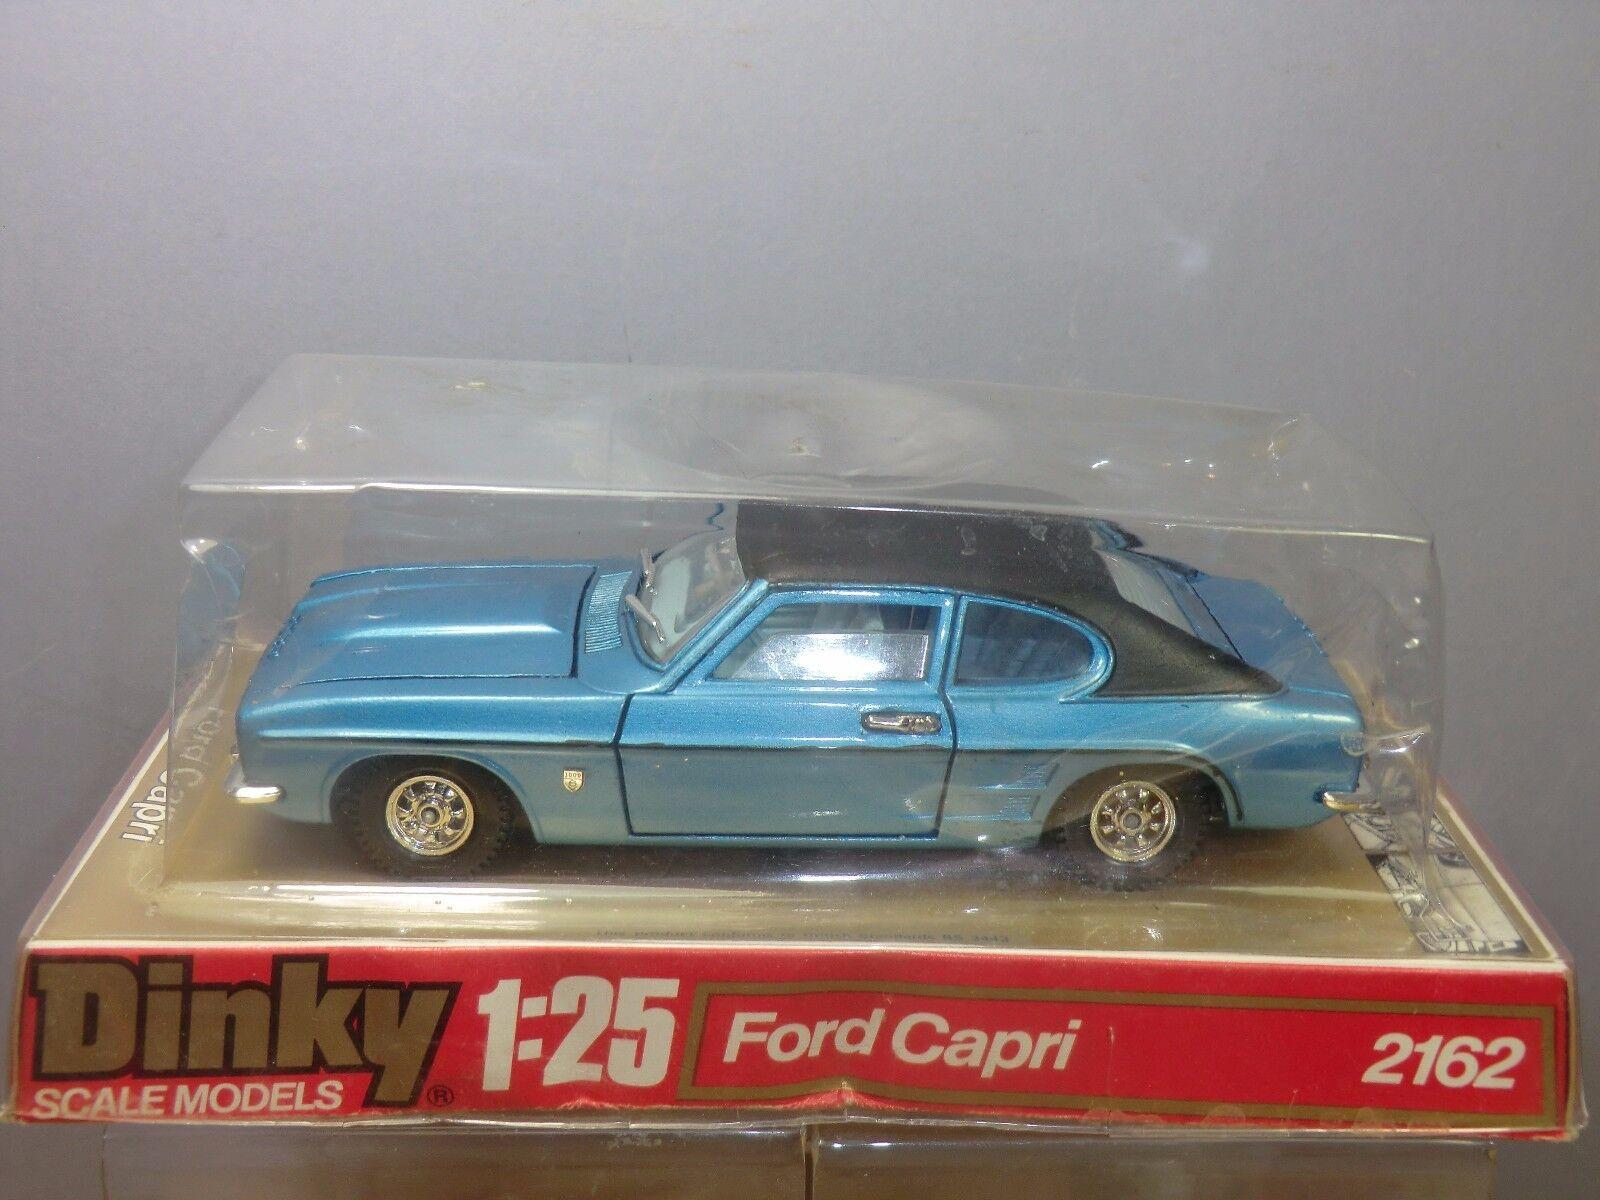 Schäbiges toys  großen modell, no.2162 ford capri sports saloon im mib